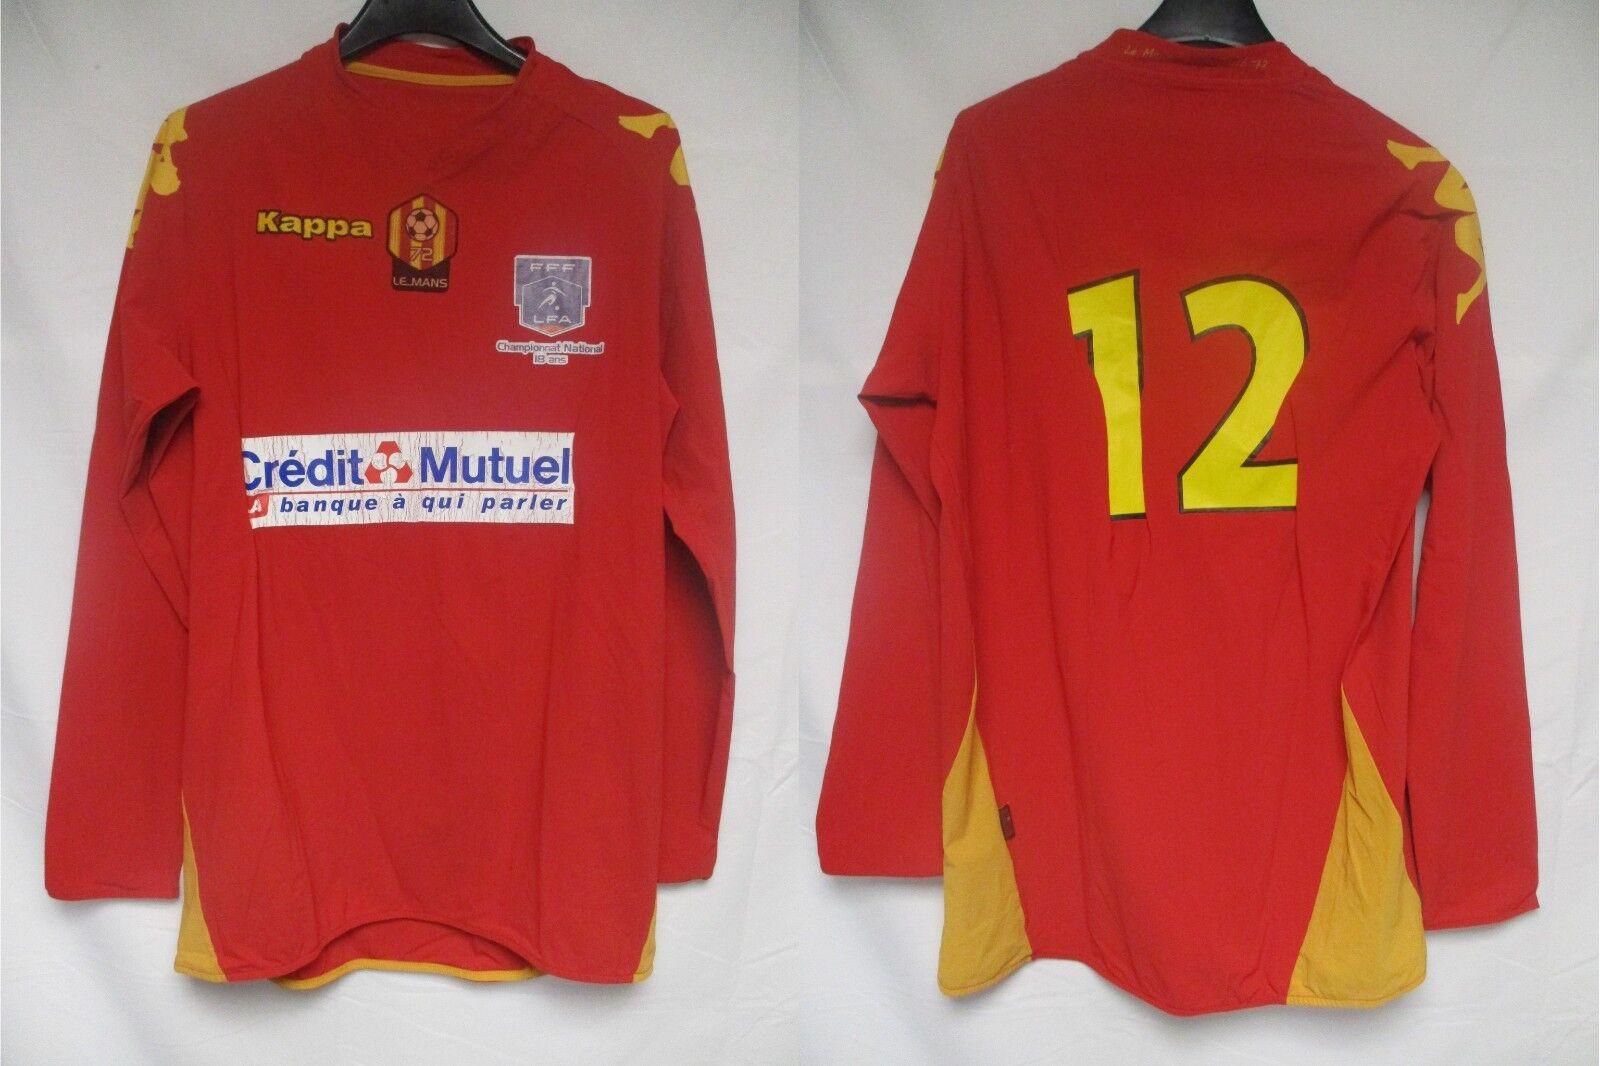 Maillot LE MANS 72 MUC porté n°12  KAPPA match worn shirt manches Largoues XL  tienda hace compras y ventas